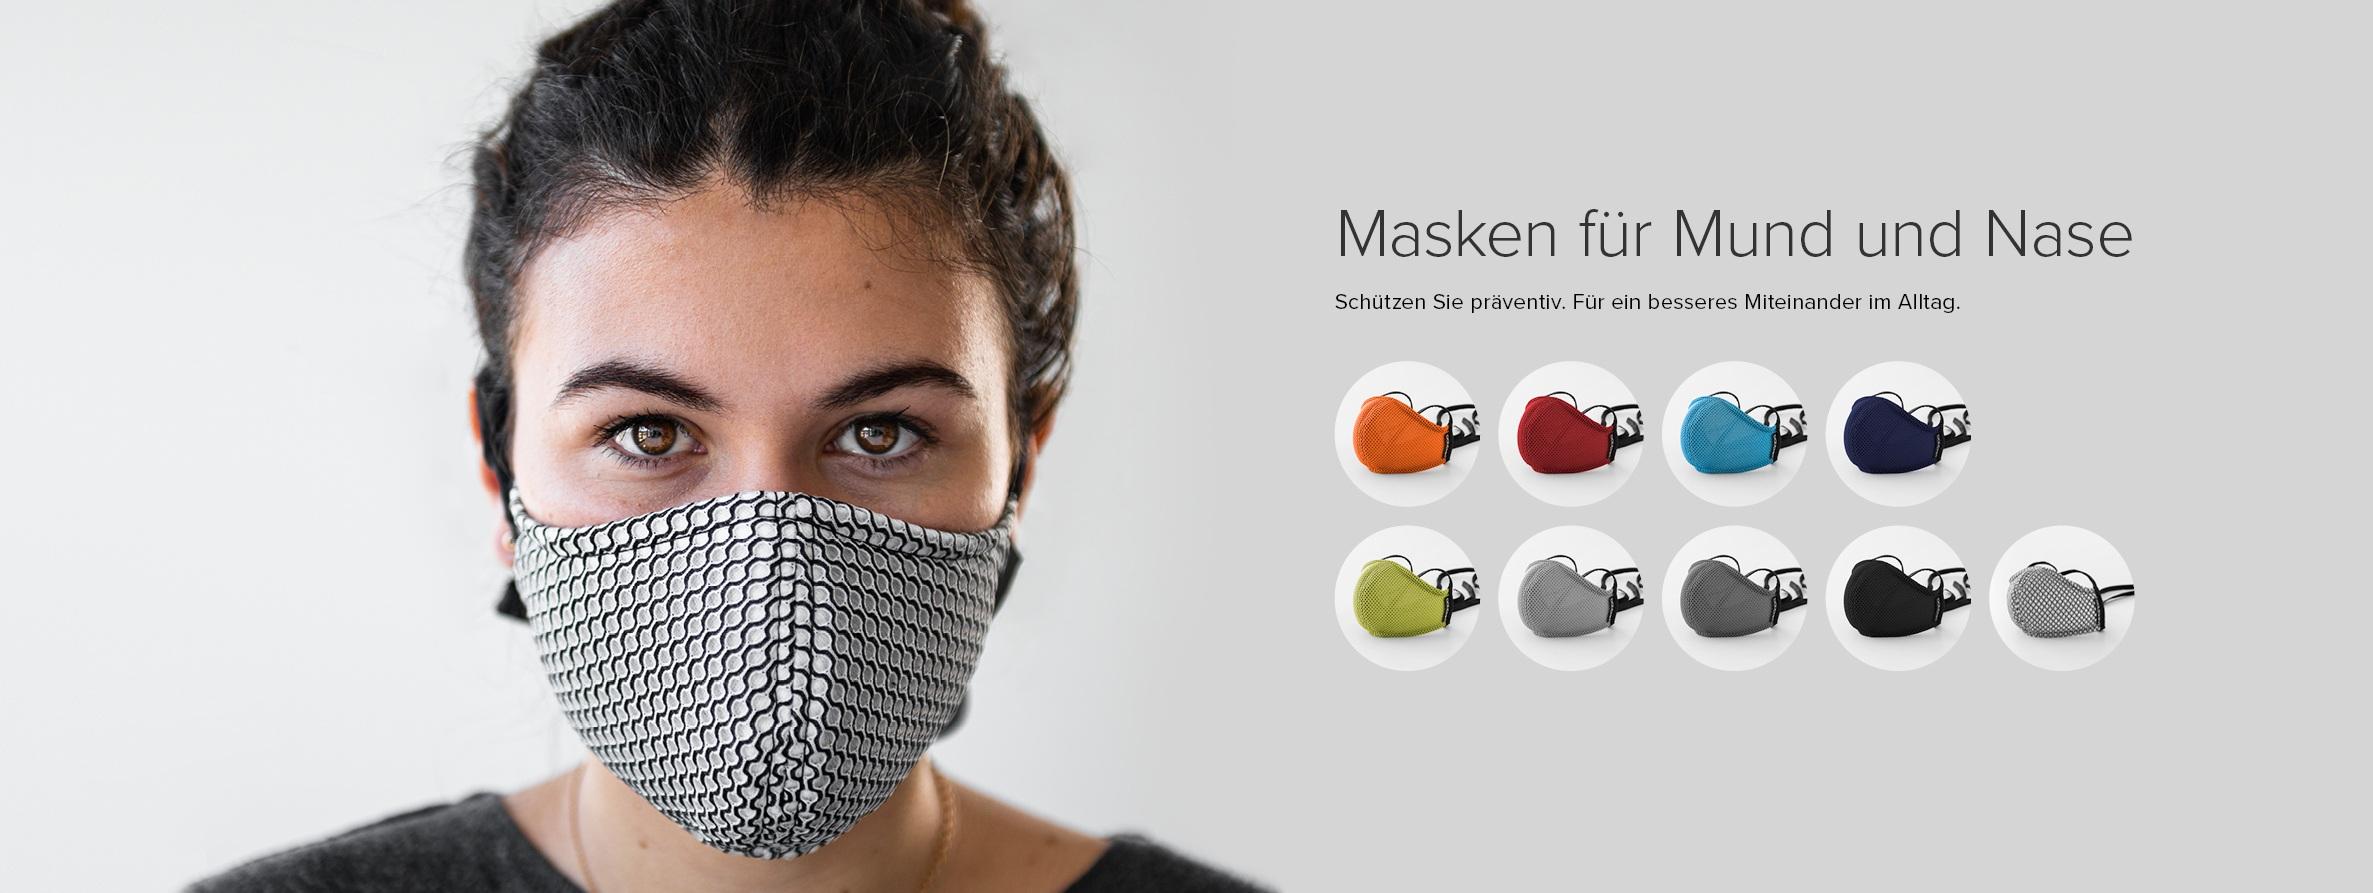 Mund-Nase-Maske-Kopie